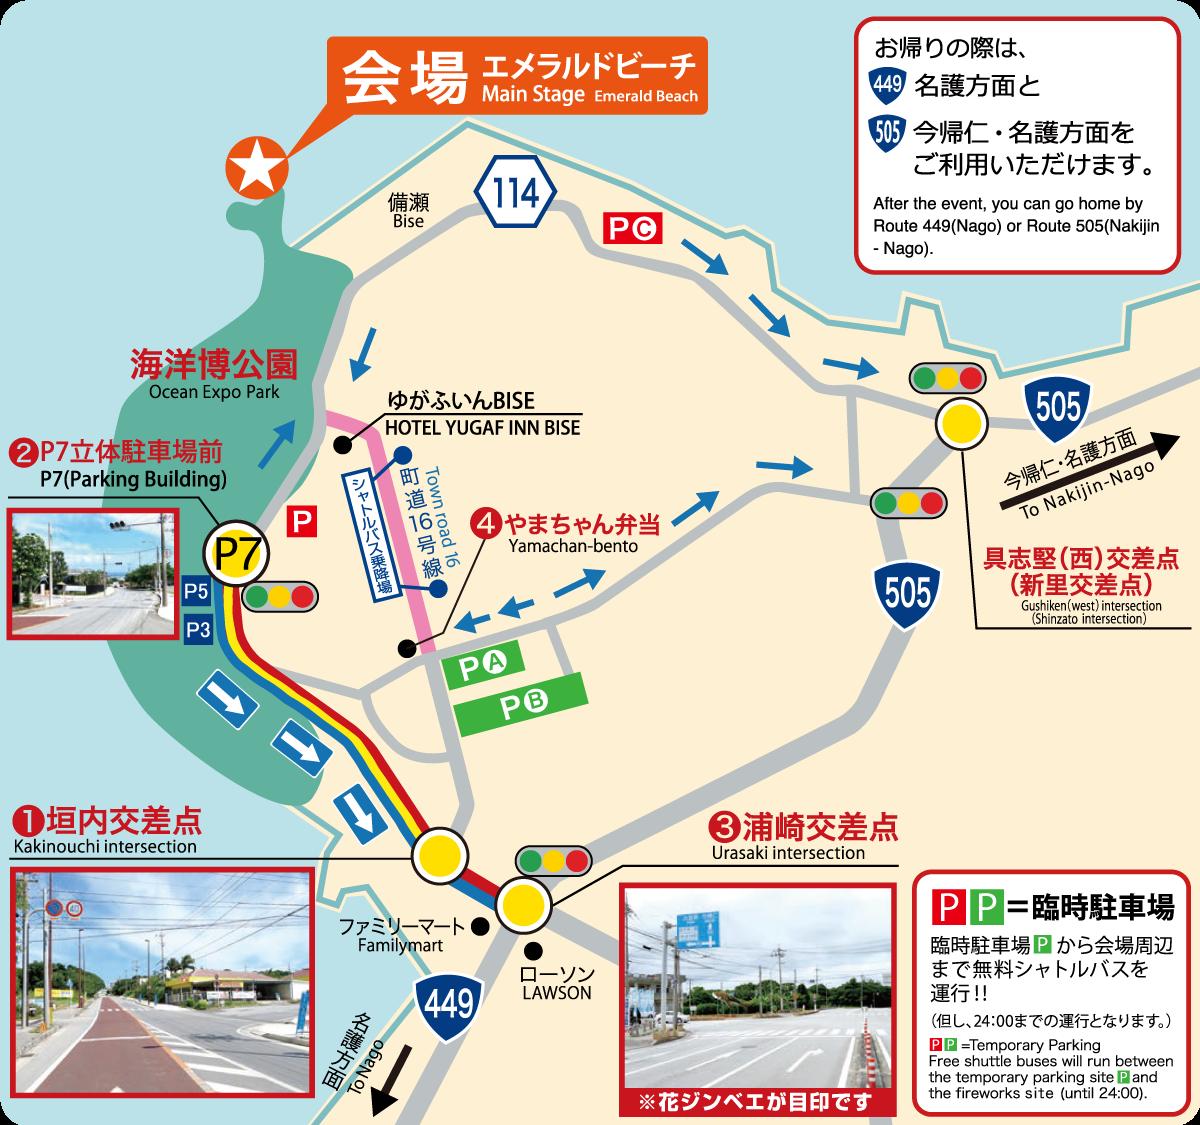 Map about traffic regulation